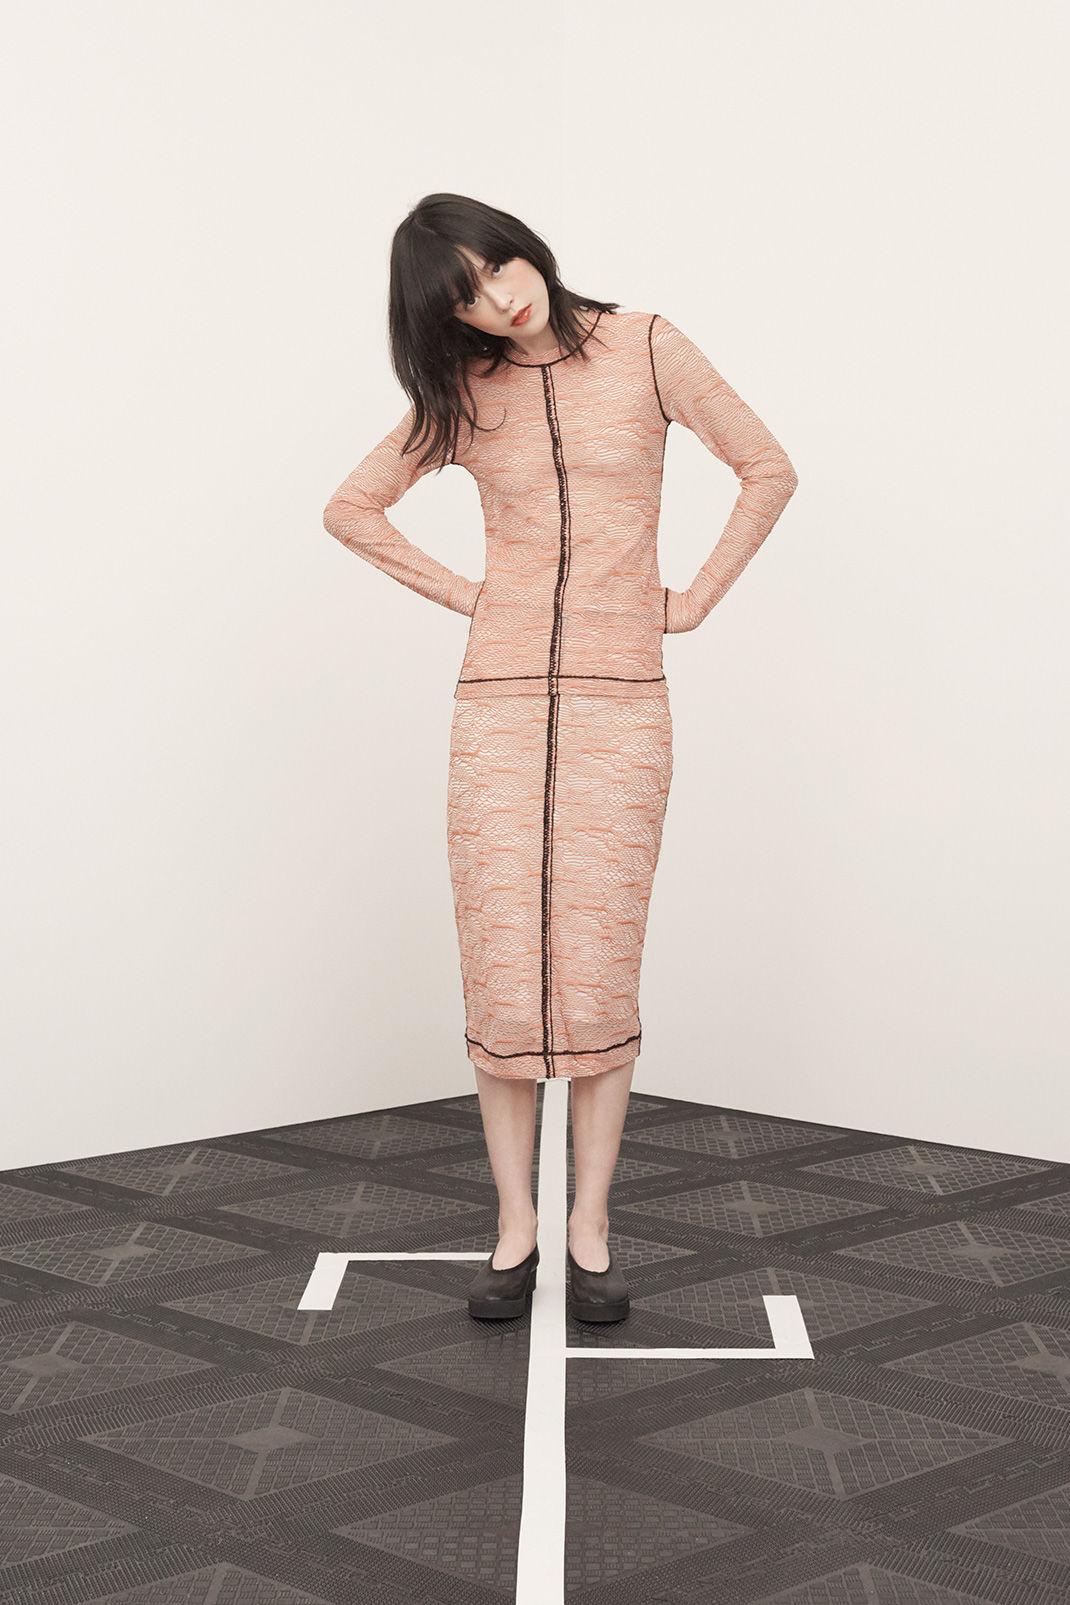 Kenzo-fashion-show-pre-fall-2016-ready-to-wear-the-impression-14